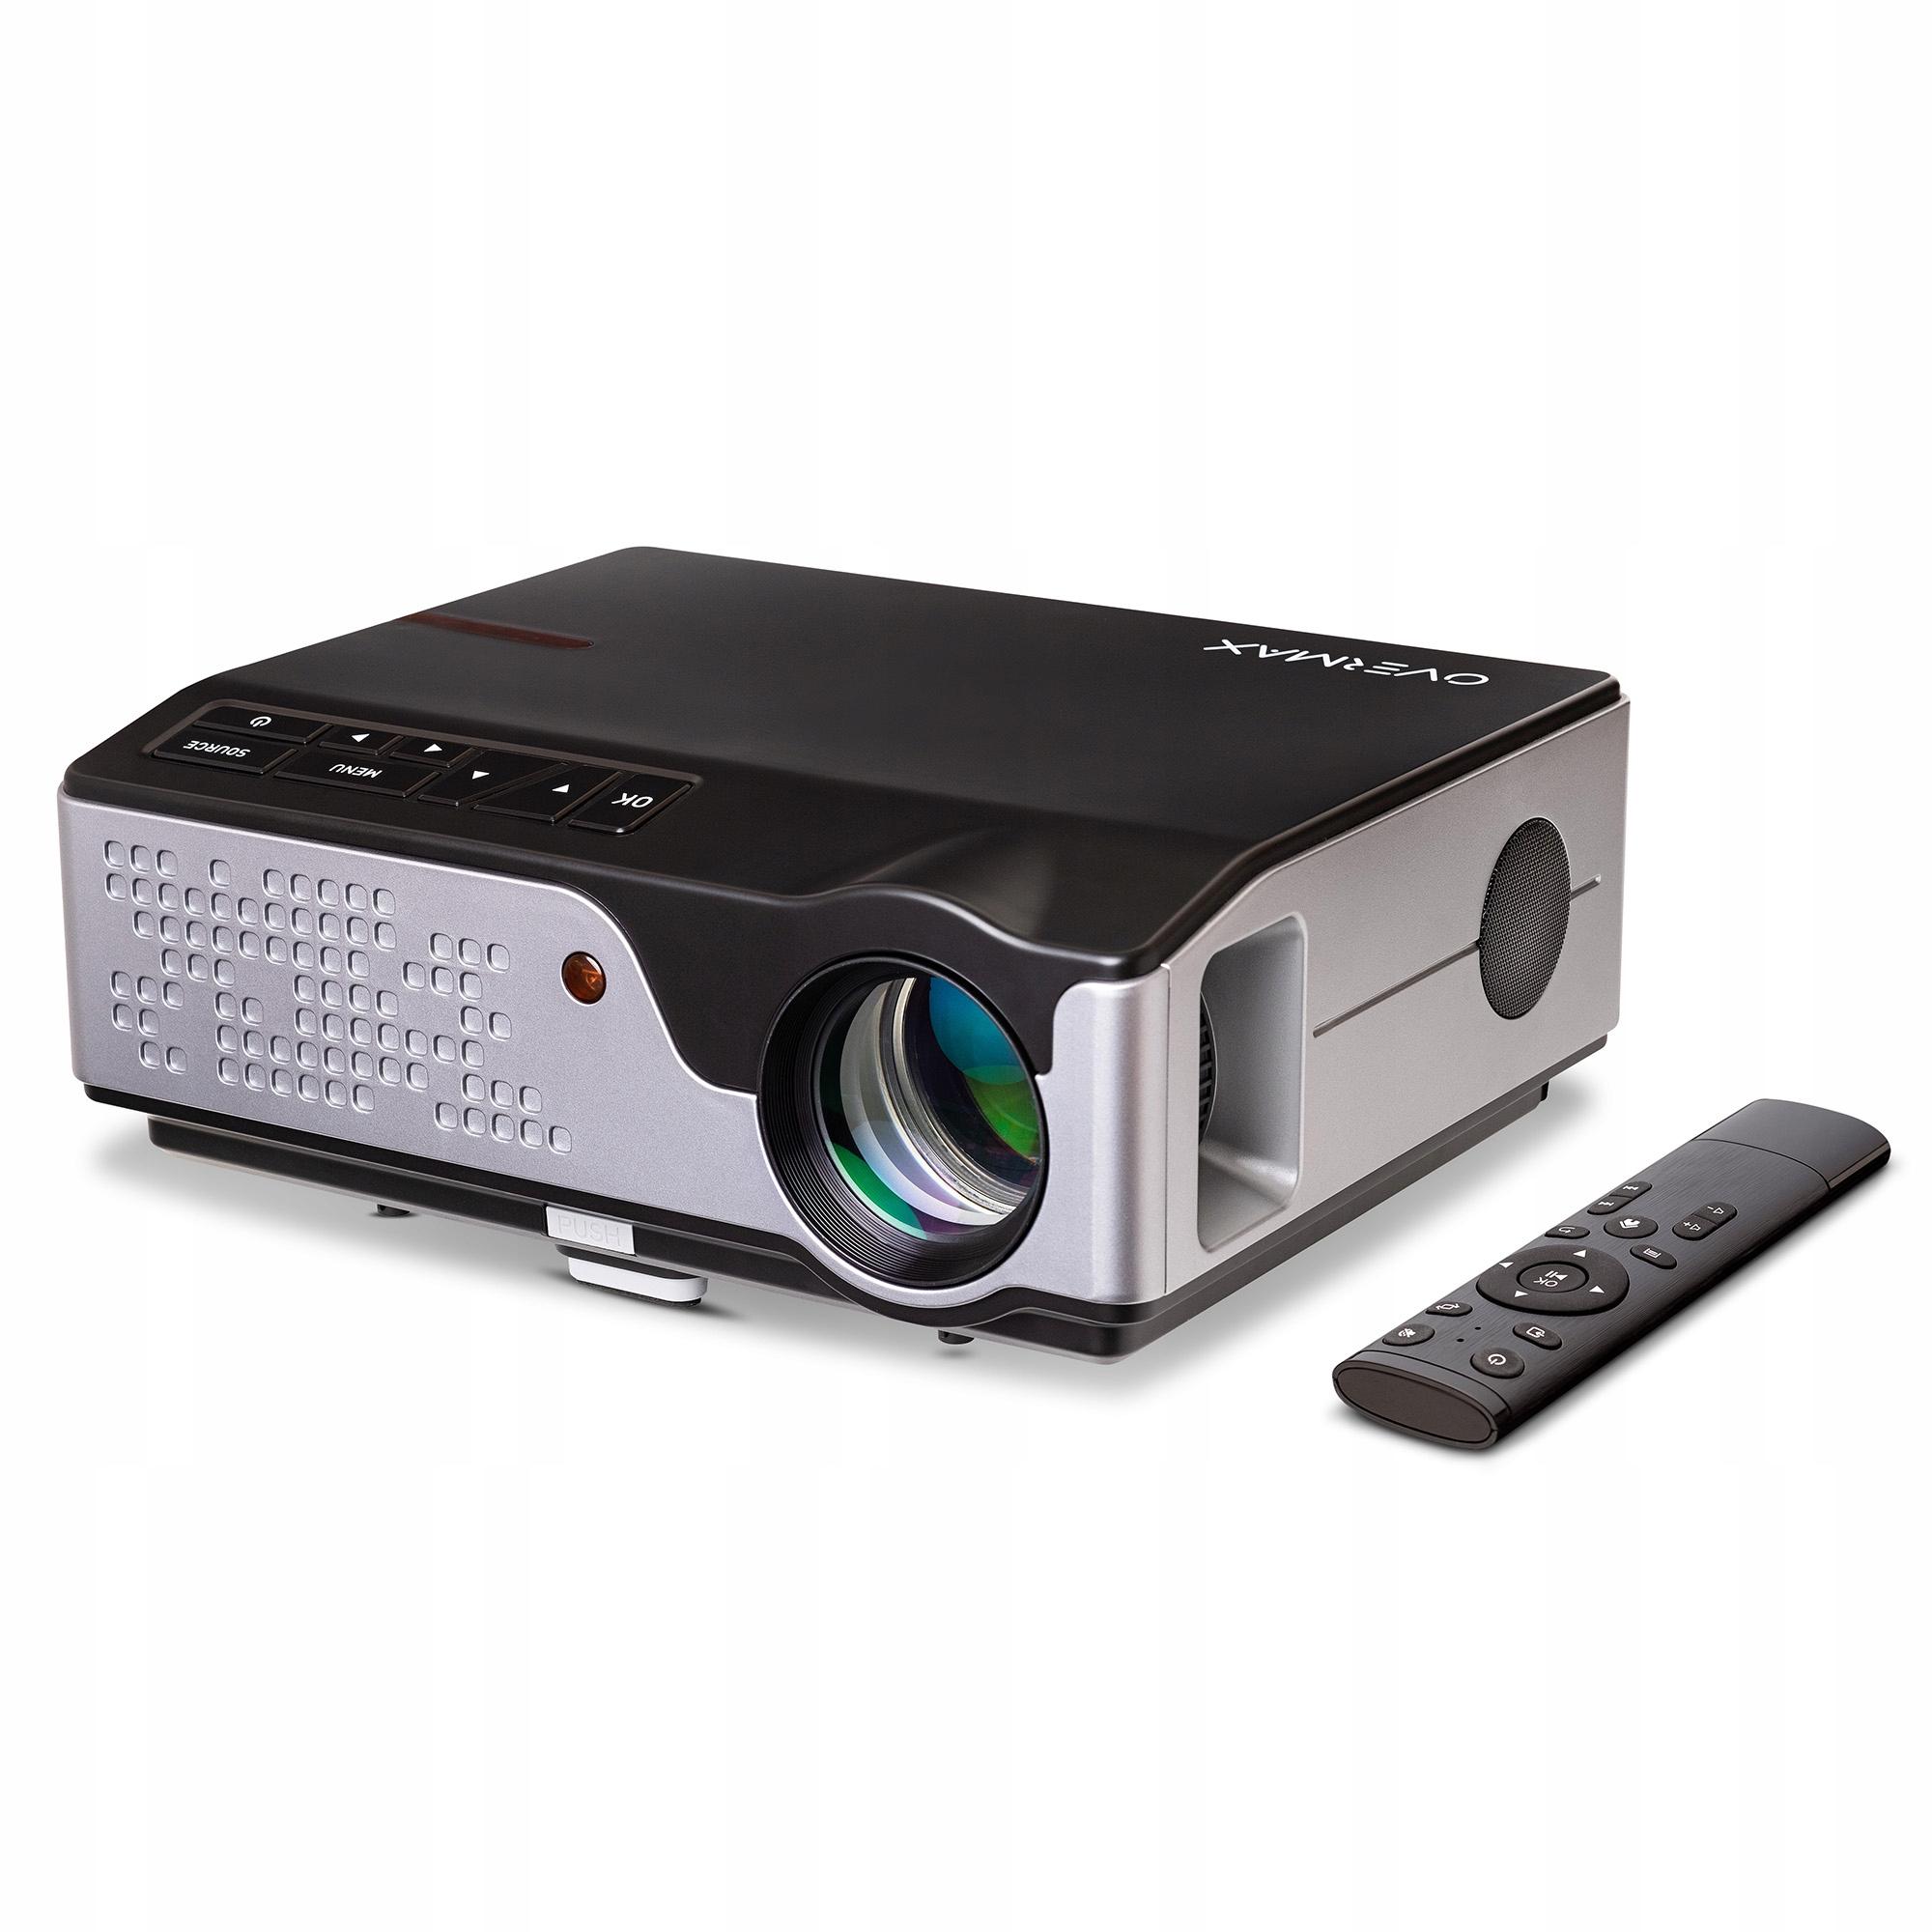 ПРОЕКТОР OVERMAX MULTIPIC 4.1 LED FULL HD PROJECTOR